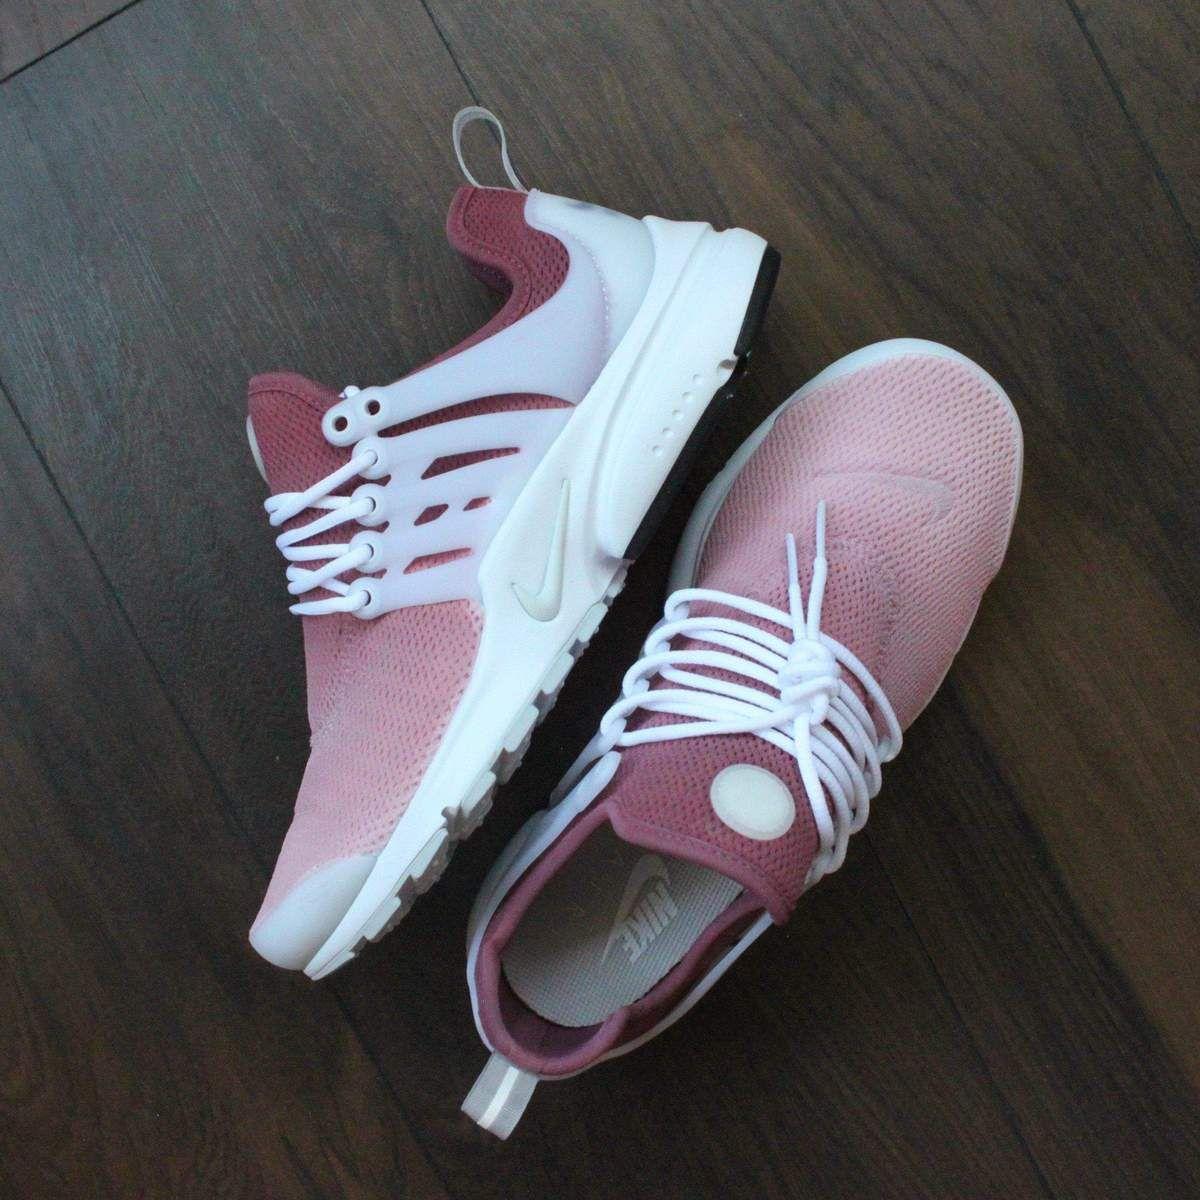 Nike Presto Red Rose Custom Sneakers